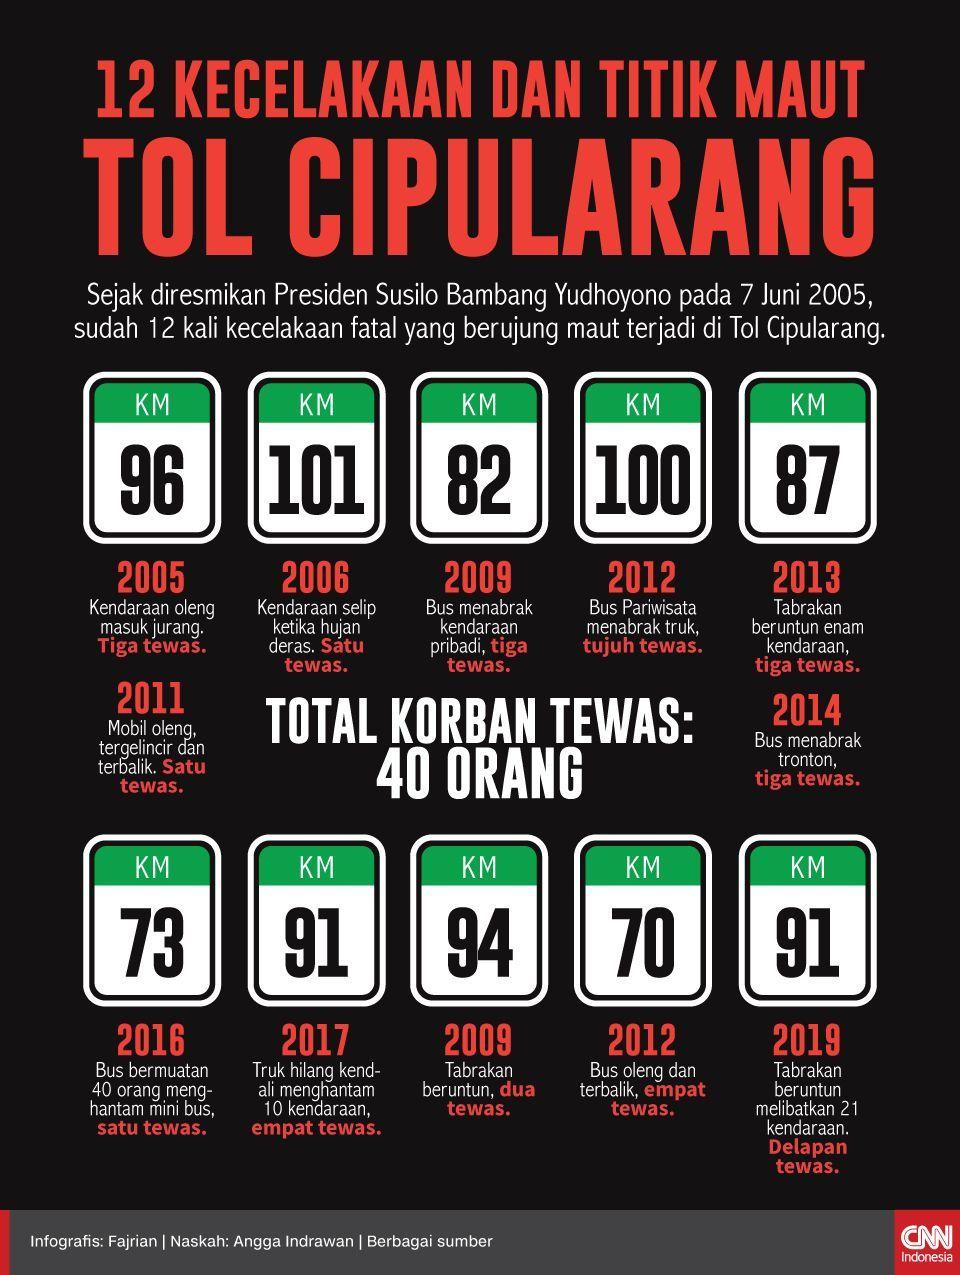 Infografis 12 kecelakaan dan titik maut tol Cipularang